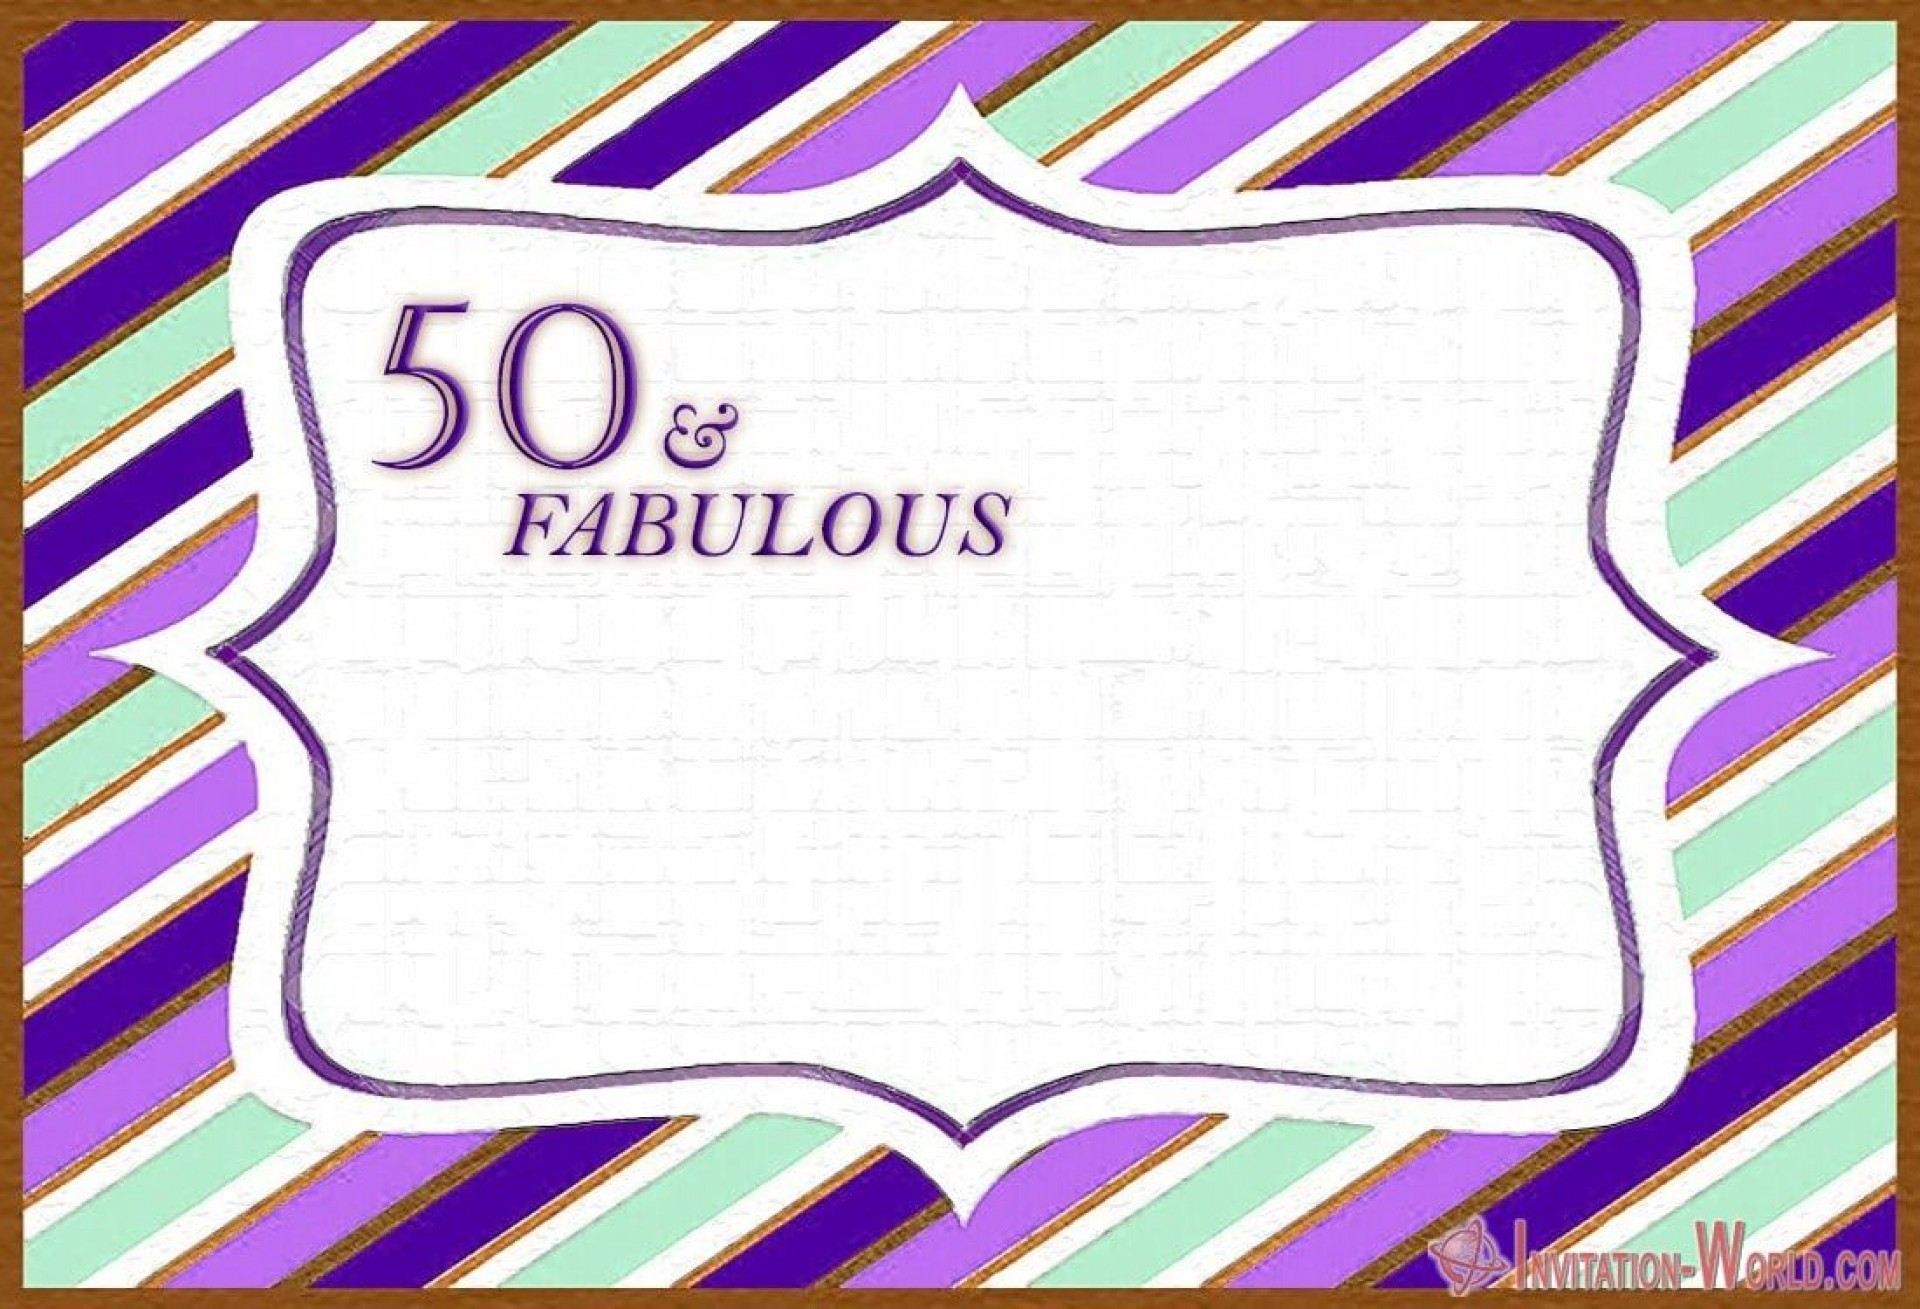 002 Stupendou Birthday Invitation Template Word 2020 High Definition 1920